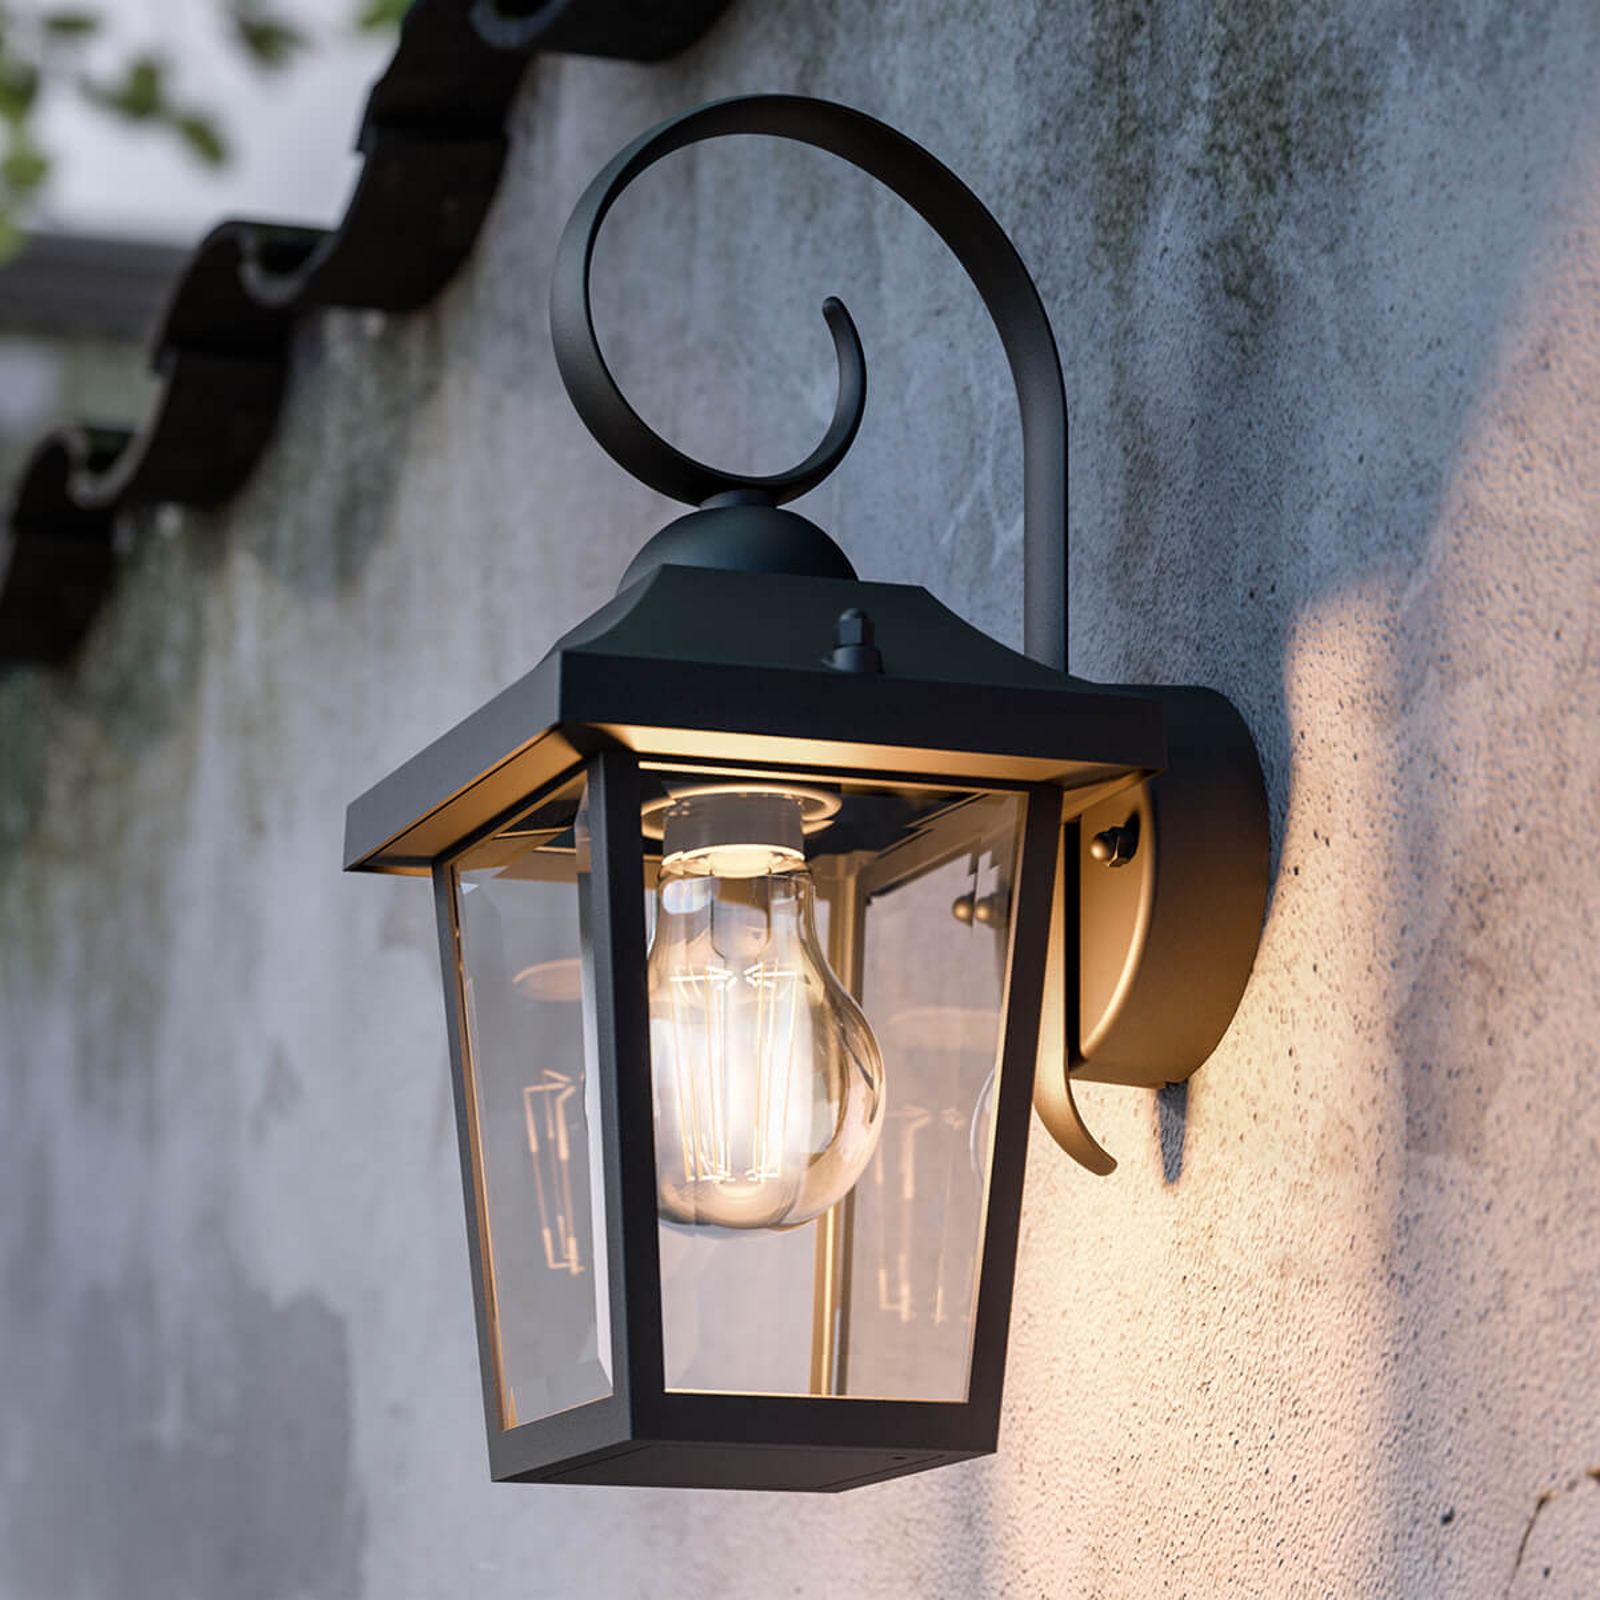 Buzzard myGarden - sort udendørs væglampe